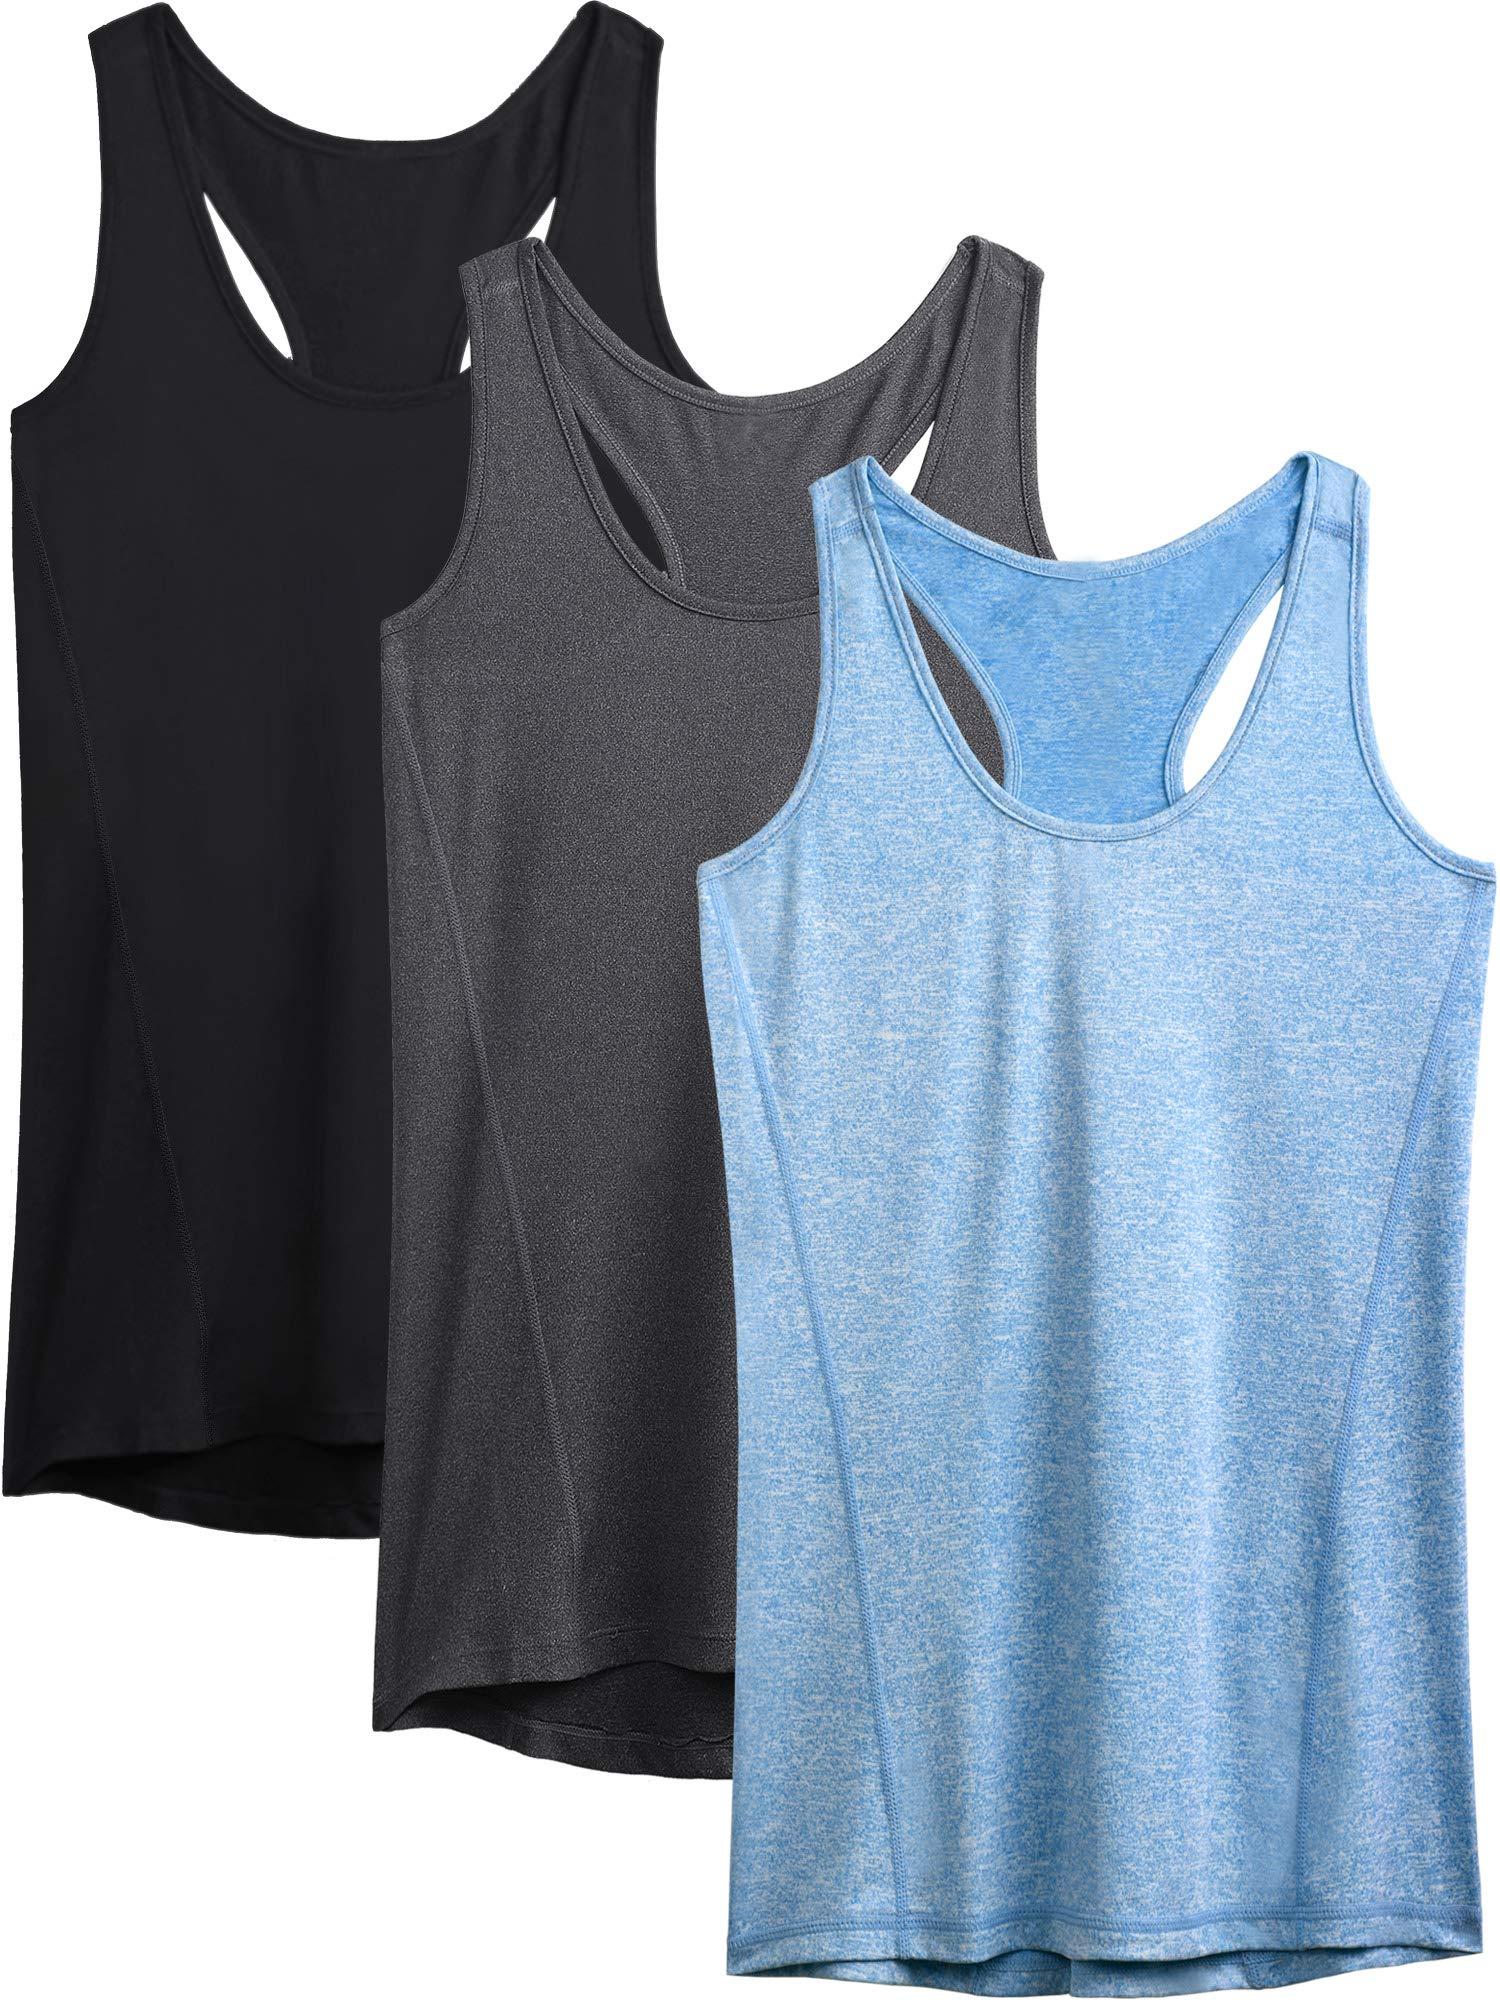 Neleus Workout Running Racerback Long Tank Top for Women,8006,3 Pack,Black,Grey,Blue,US S,EU M by Neleus